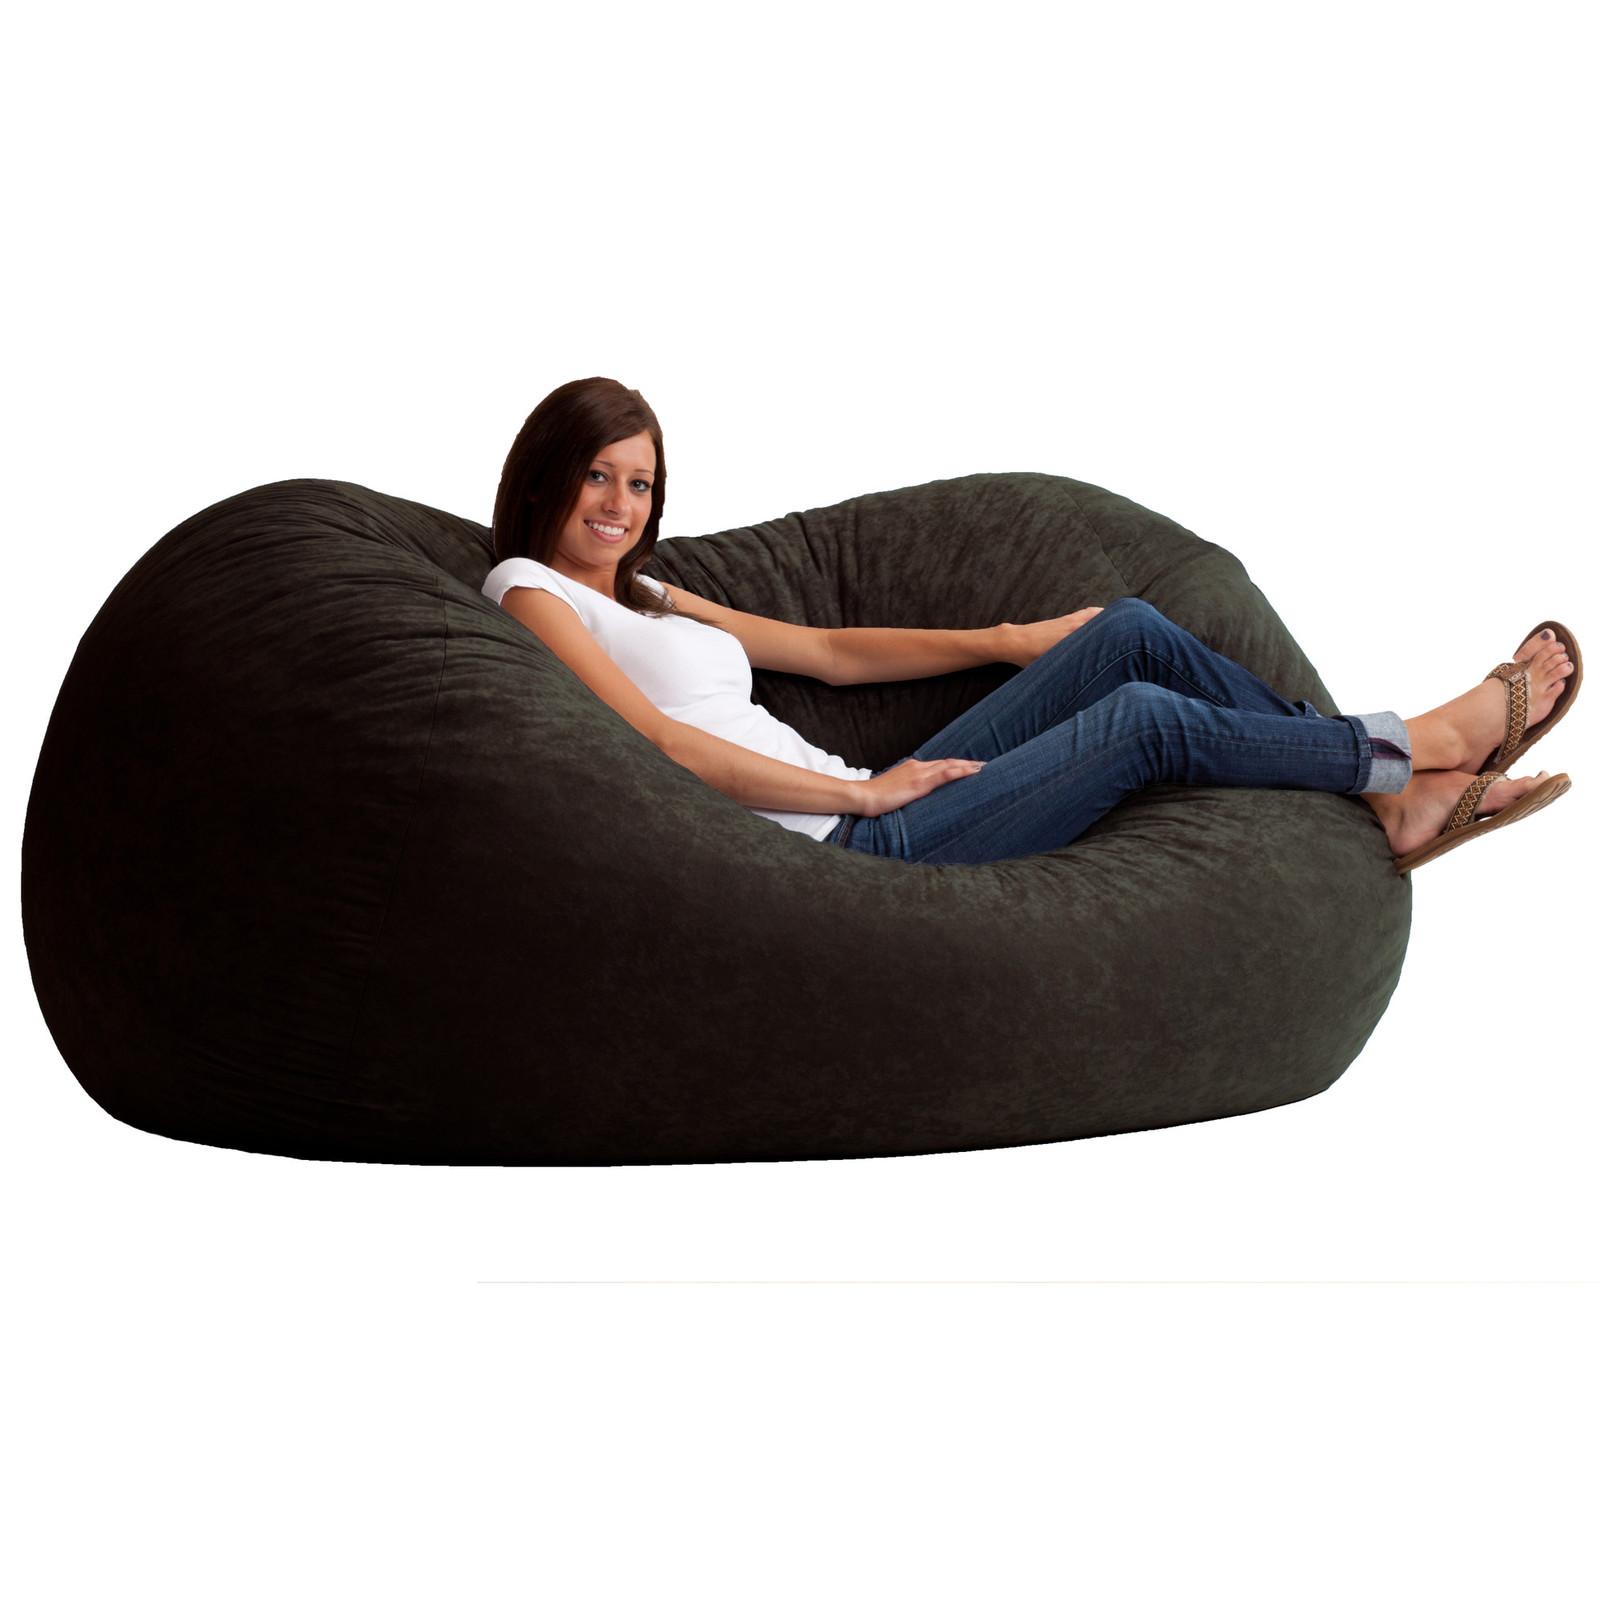 Bean Bag Sofa Xl Extra Large Black Furniture Relax Family